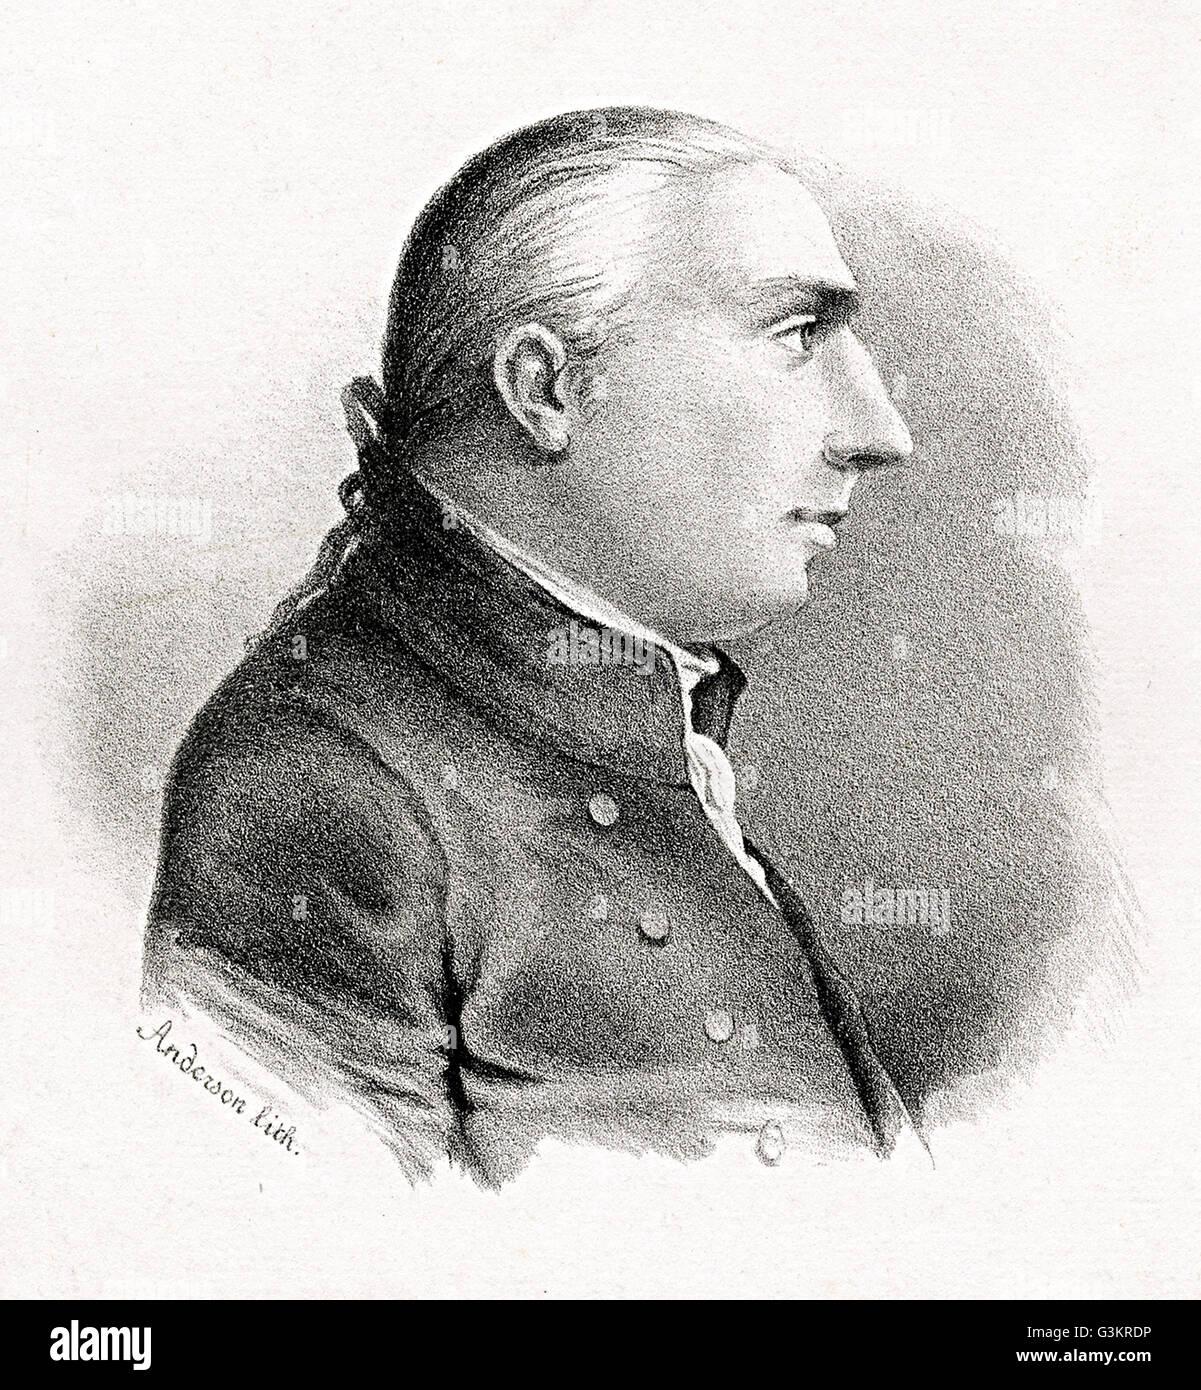 Rufus Putnam, 1738 - 1824 - Stock Image